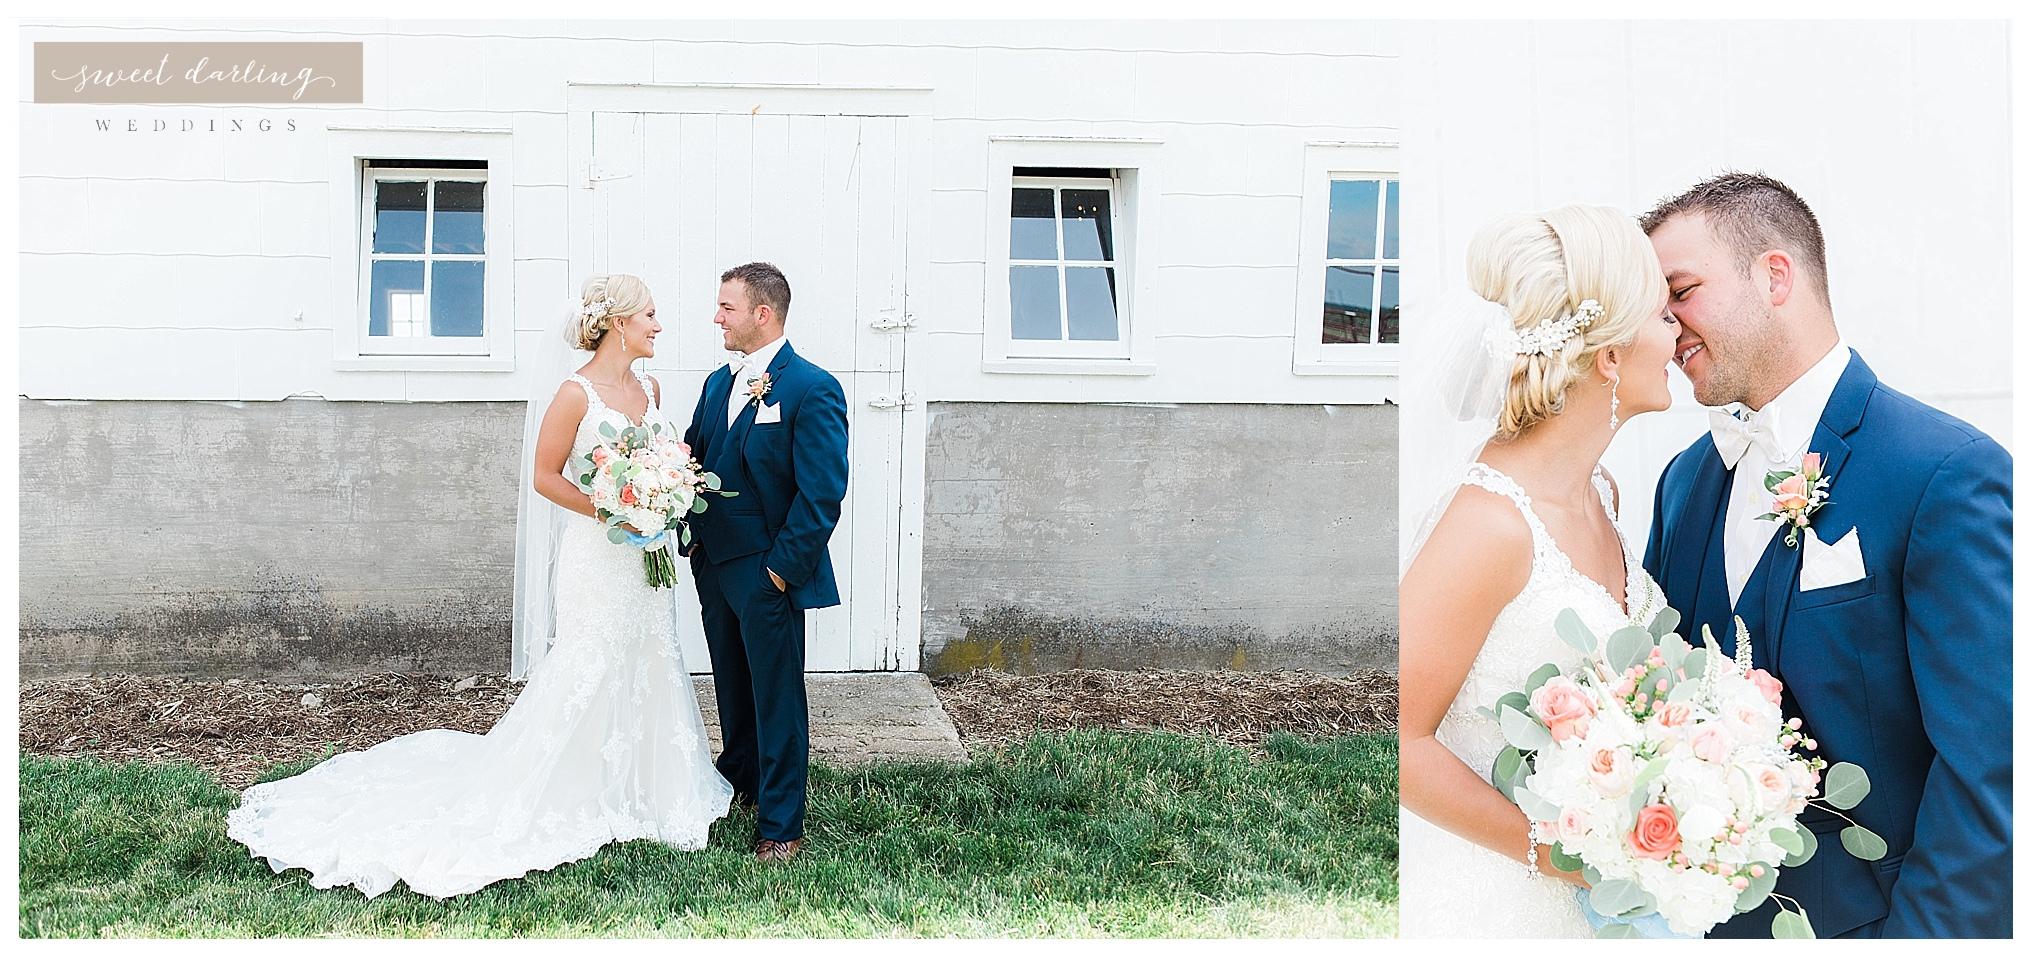 Paxton-illinois-engelbrecht-farmstead-romantic-wedding-photographer-sweet-darling-weddings_1218.jpg